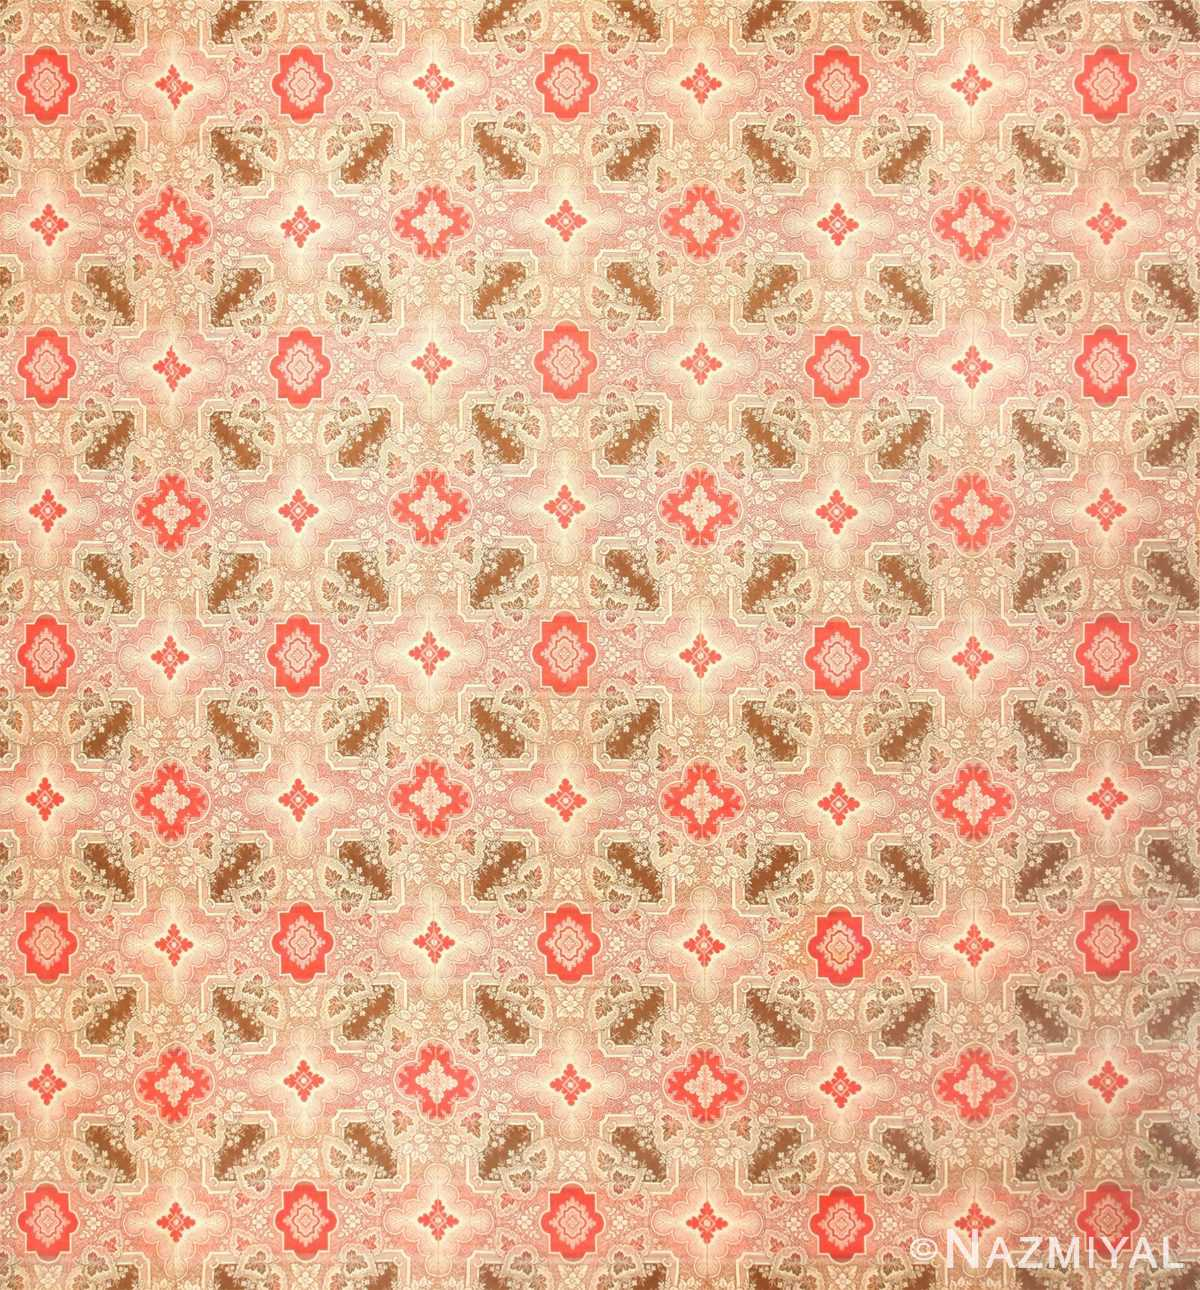 All Over Design Vintage American Ingrain Rug 50460 Nazmiyal